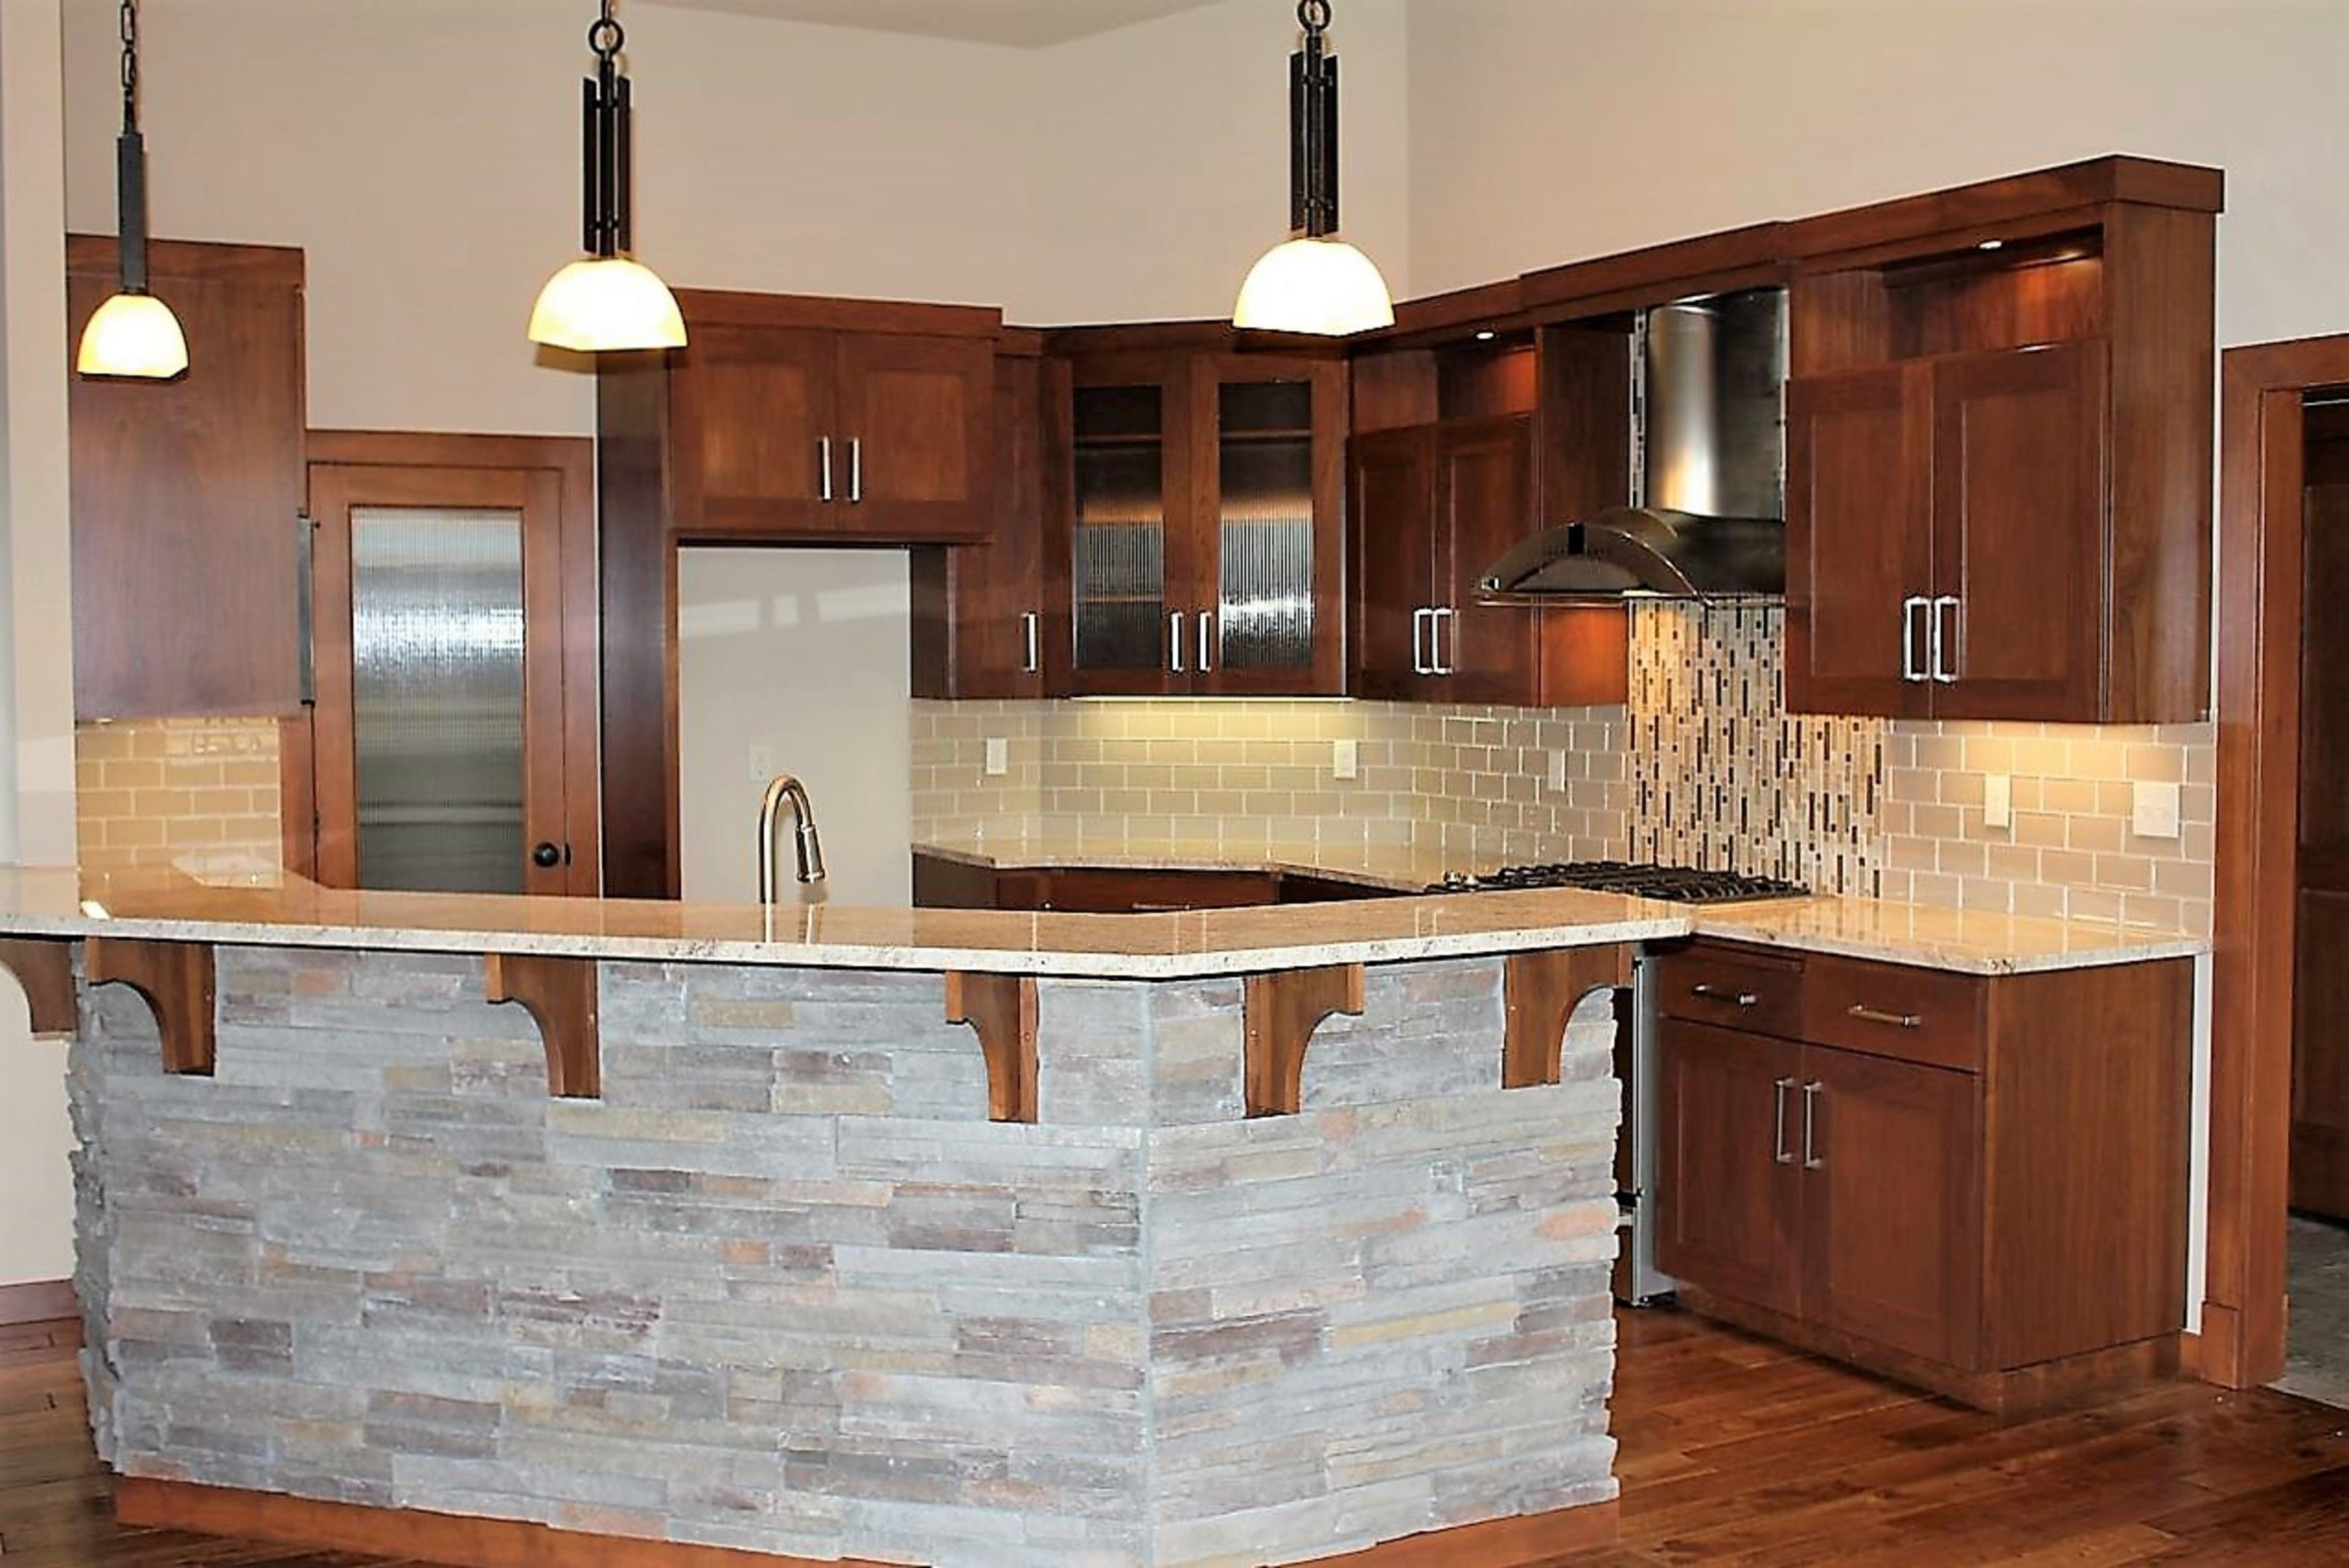 Interior Kitchen Cabinets Spokane custom kitchen cabinets spokane wa pinterest wa